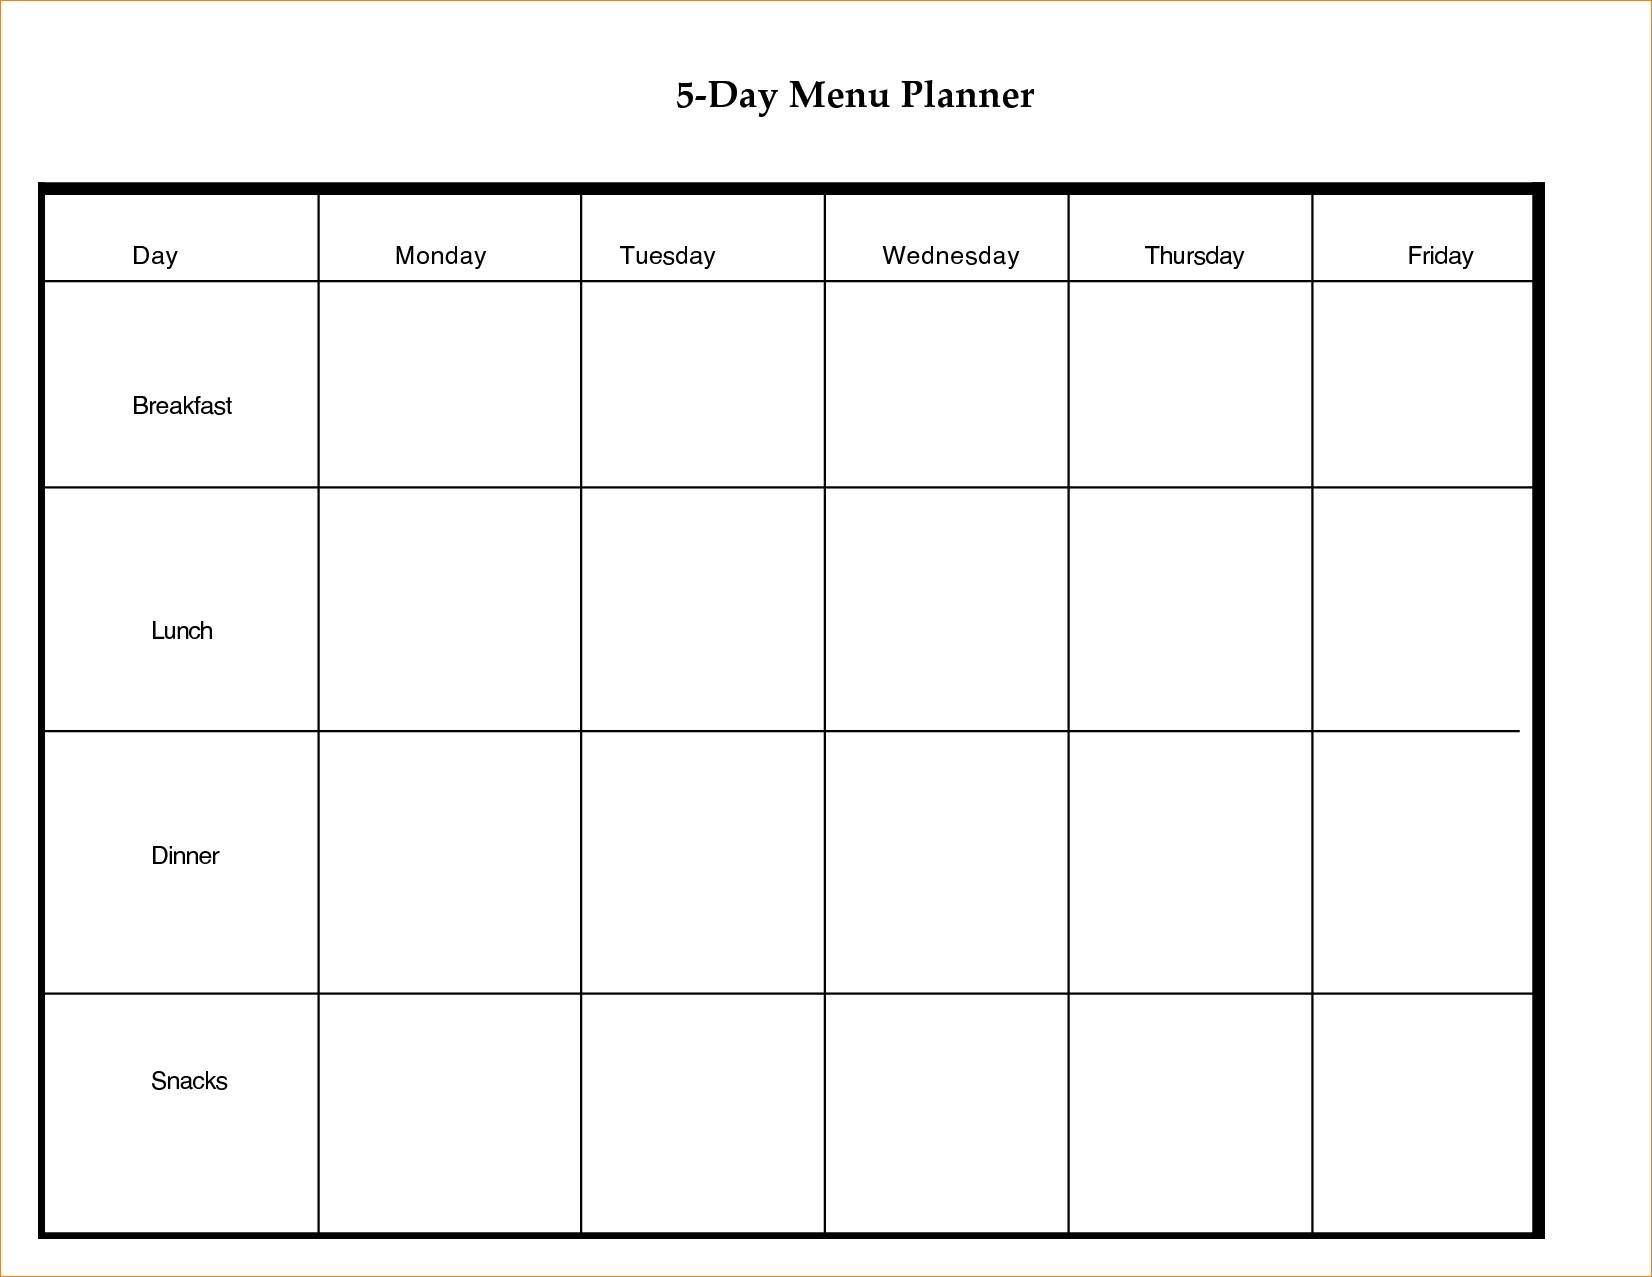 Printable 5 Day Calendar Blank Calendar Template 5 Day Week 0 8 With in Free 5 Day Calendar Template